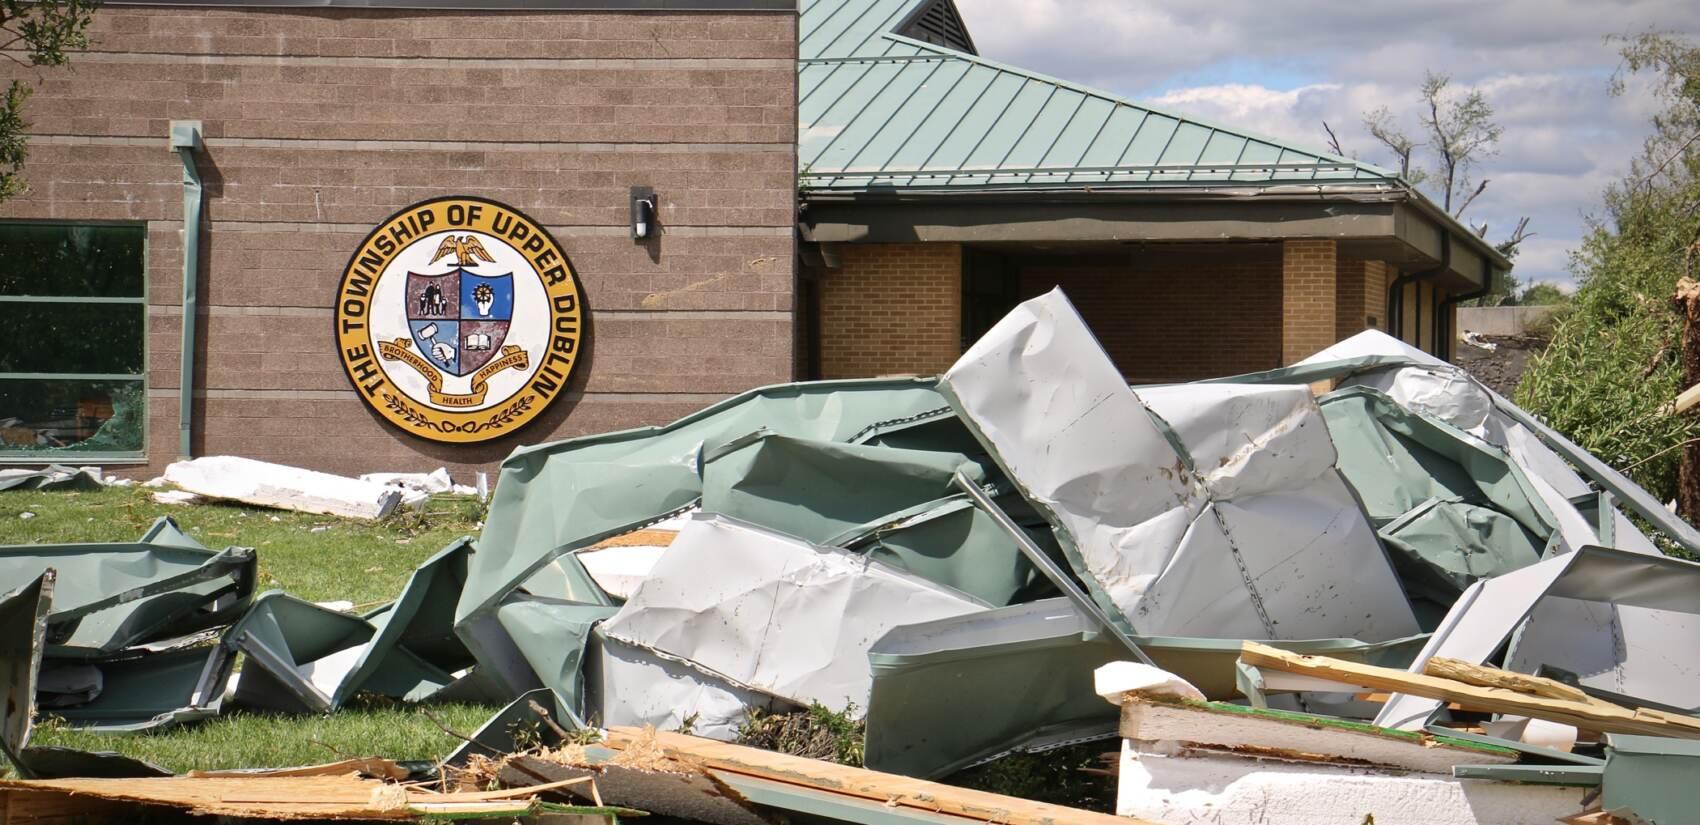 Wreckage in front of Upper Dublin High School after tornado.